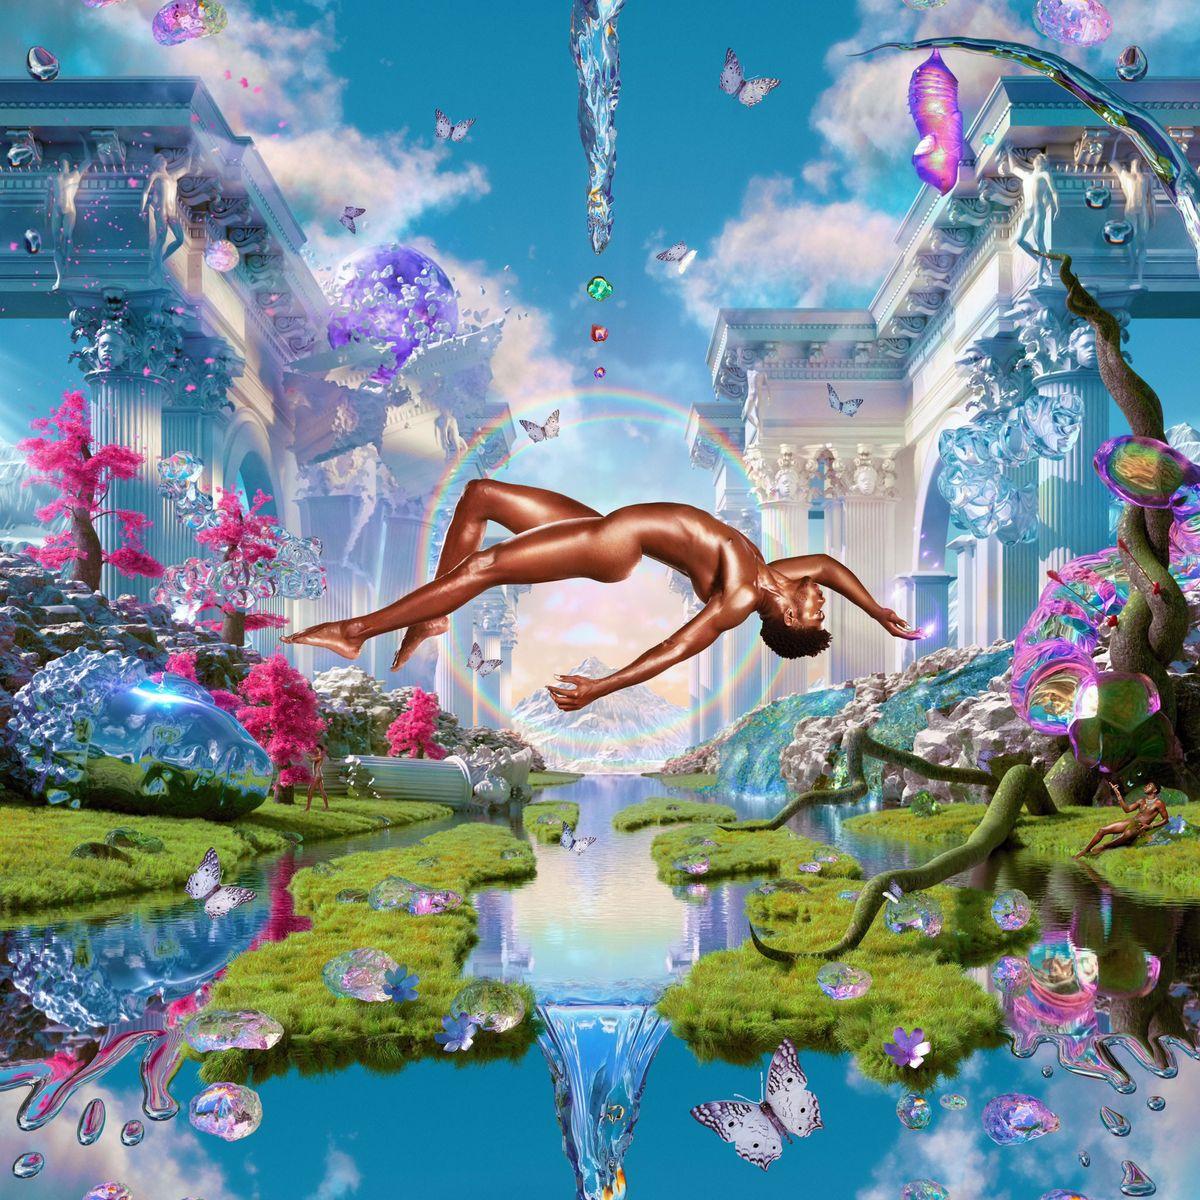 Lil Nas X Shares Naked 'Montero' Album Cover: PHOTO